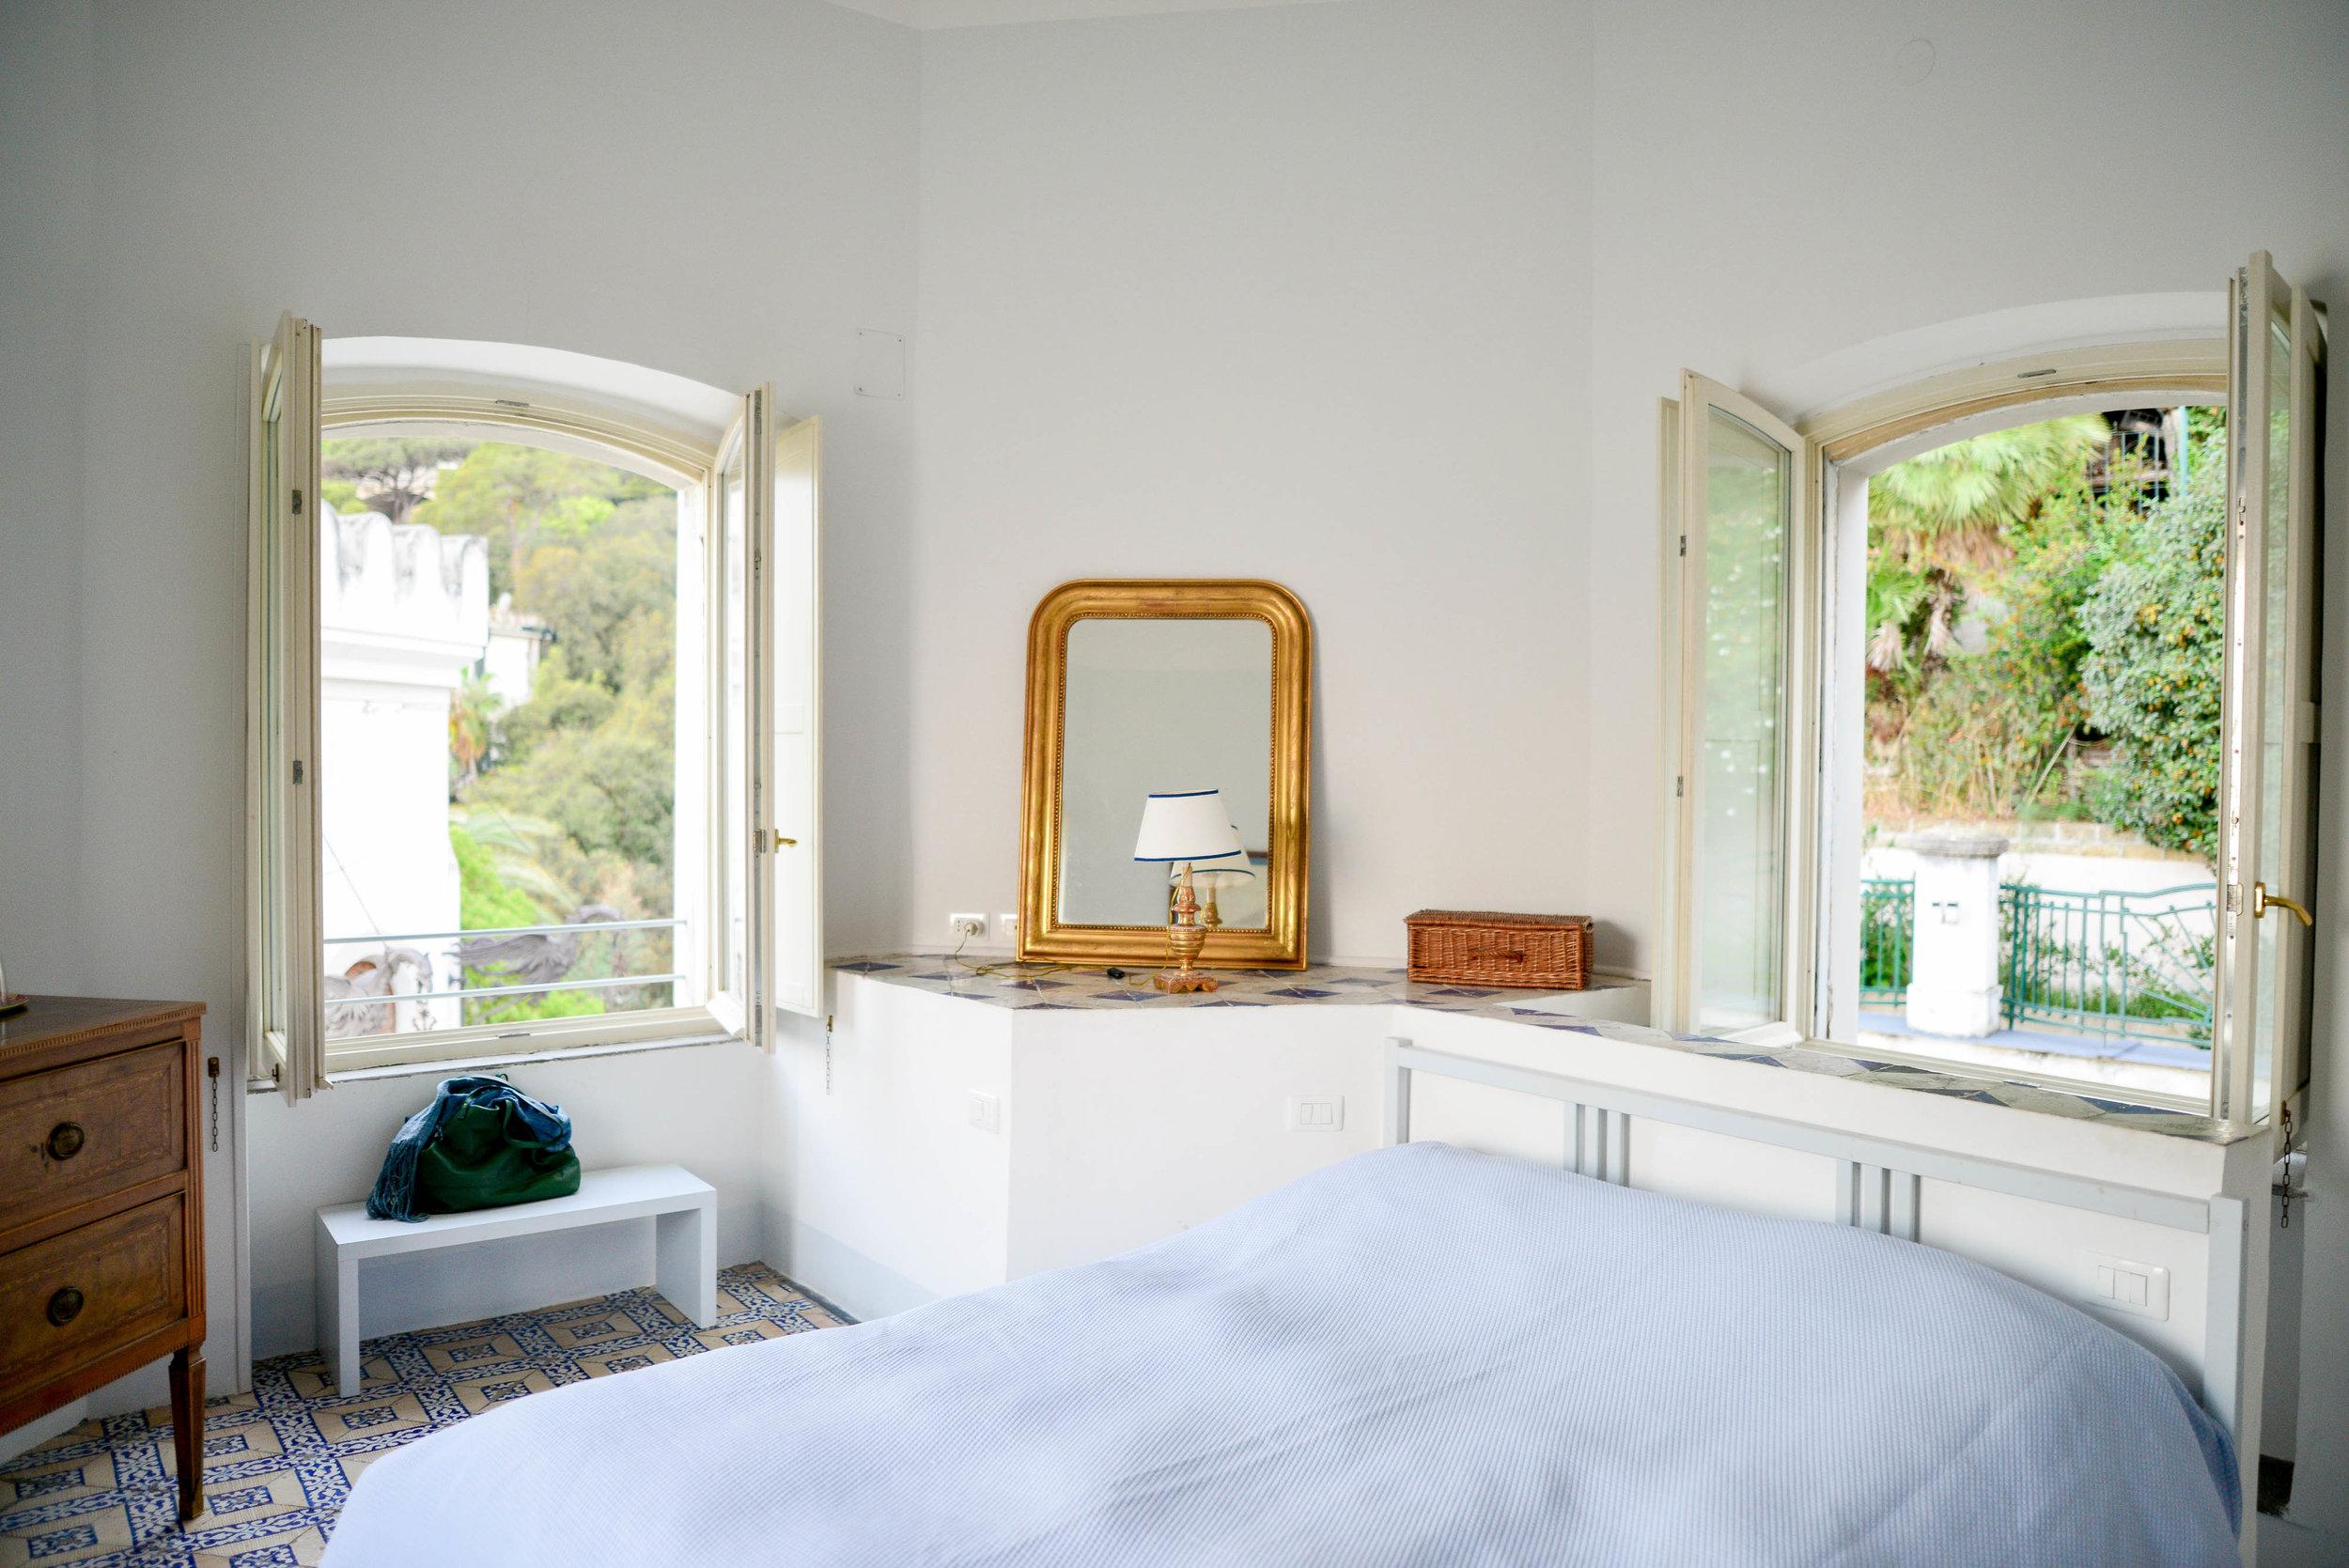 The top floor is a bedroom with almost 360˚ views | Photography: Lauren L Caron © 2018